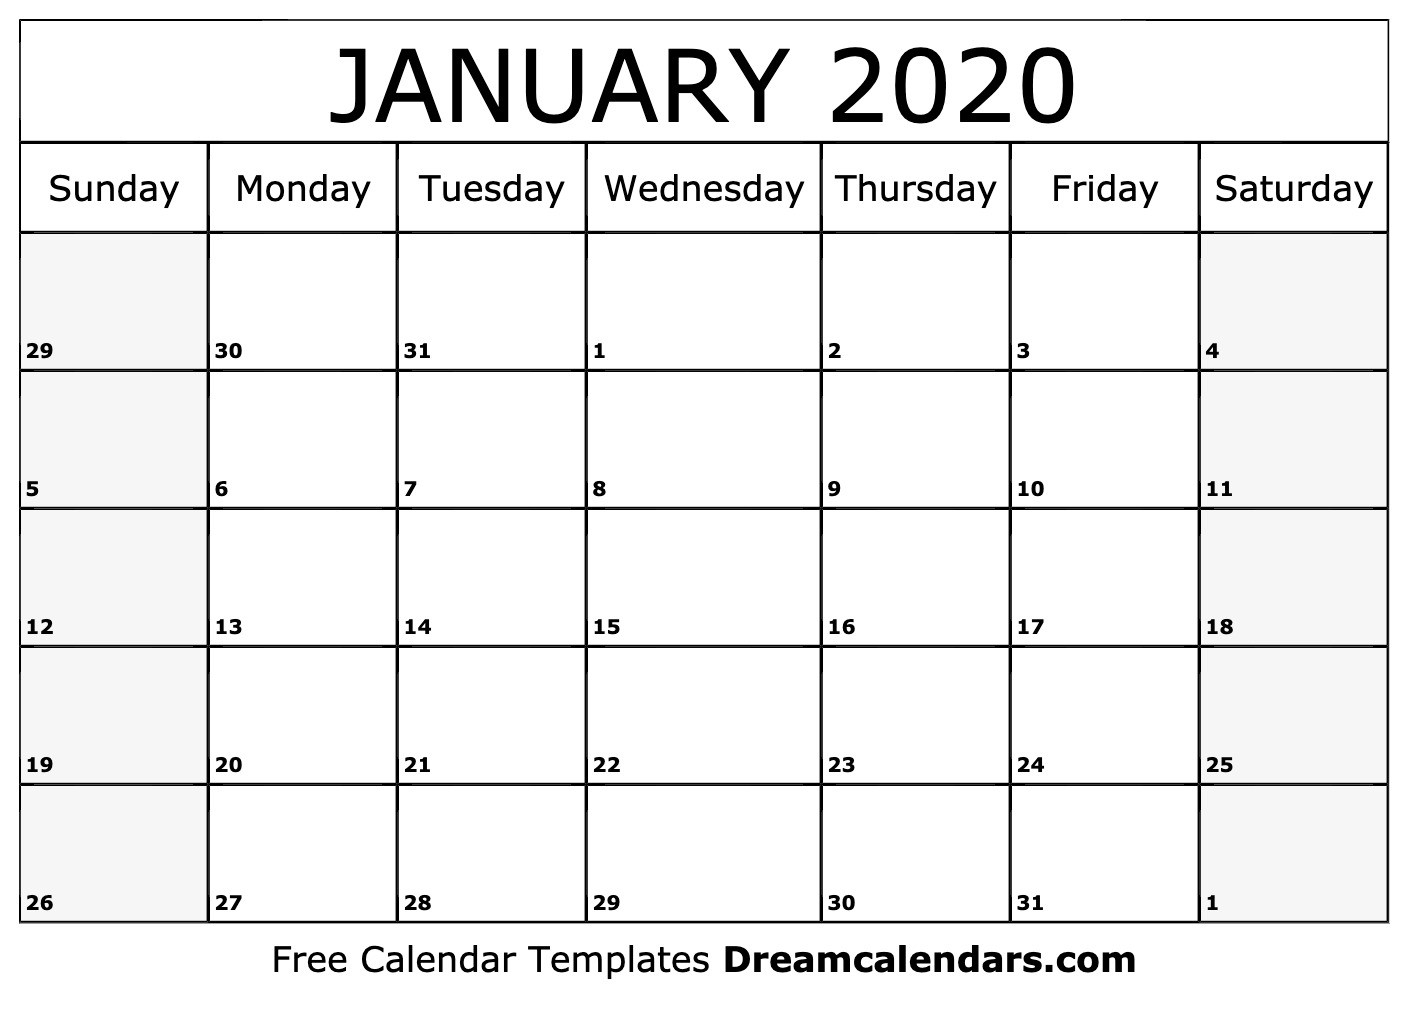 Ko-Fi - Printable January 2020 Calendar - Ko-Fi ❤️ Where-January 2020 Calendar Jpg